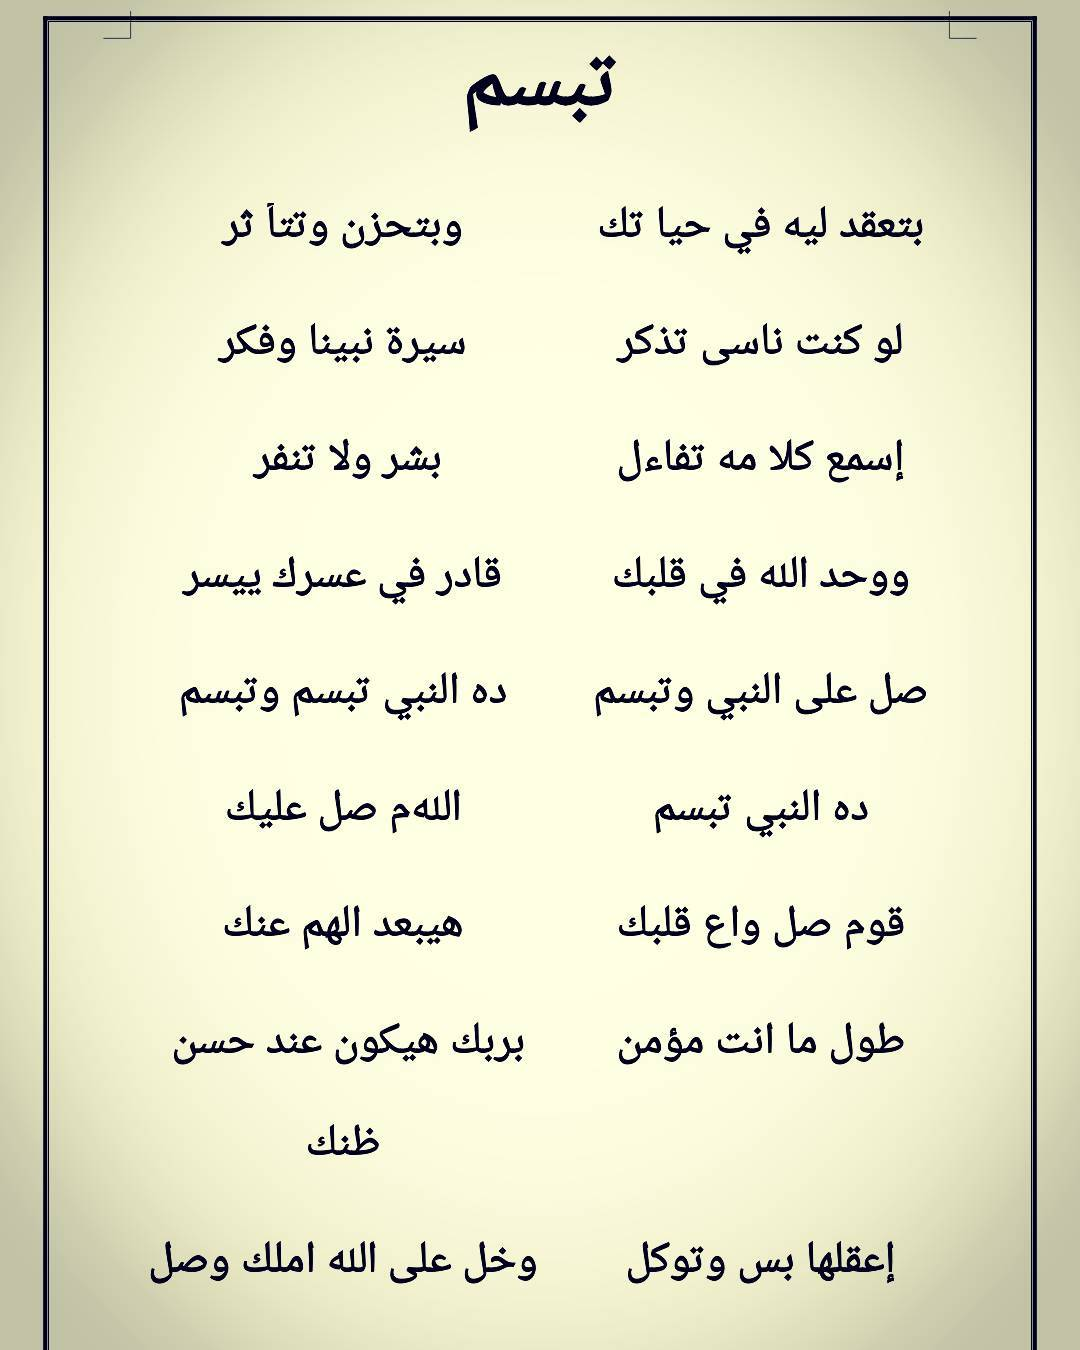 Teks Sholawat Tabassam (Mesut Kurtis)